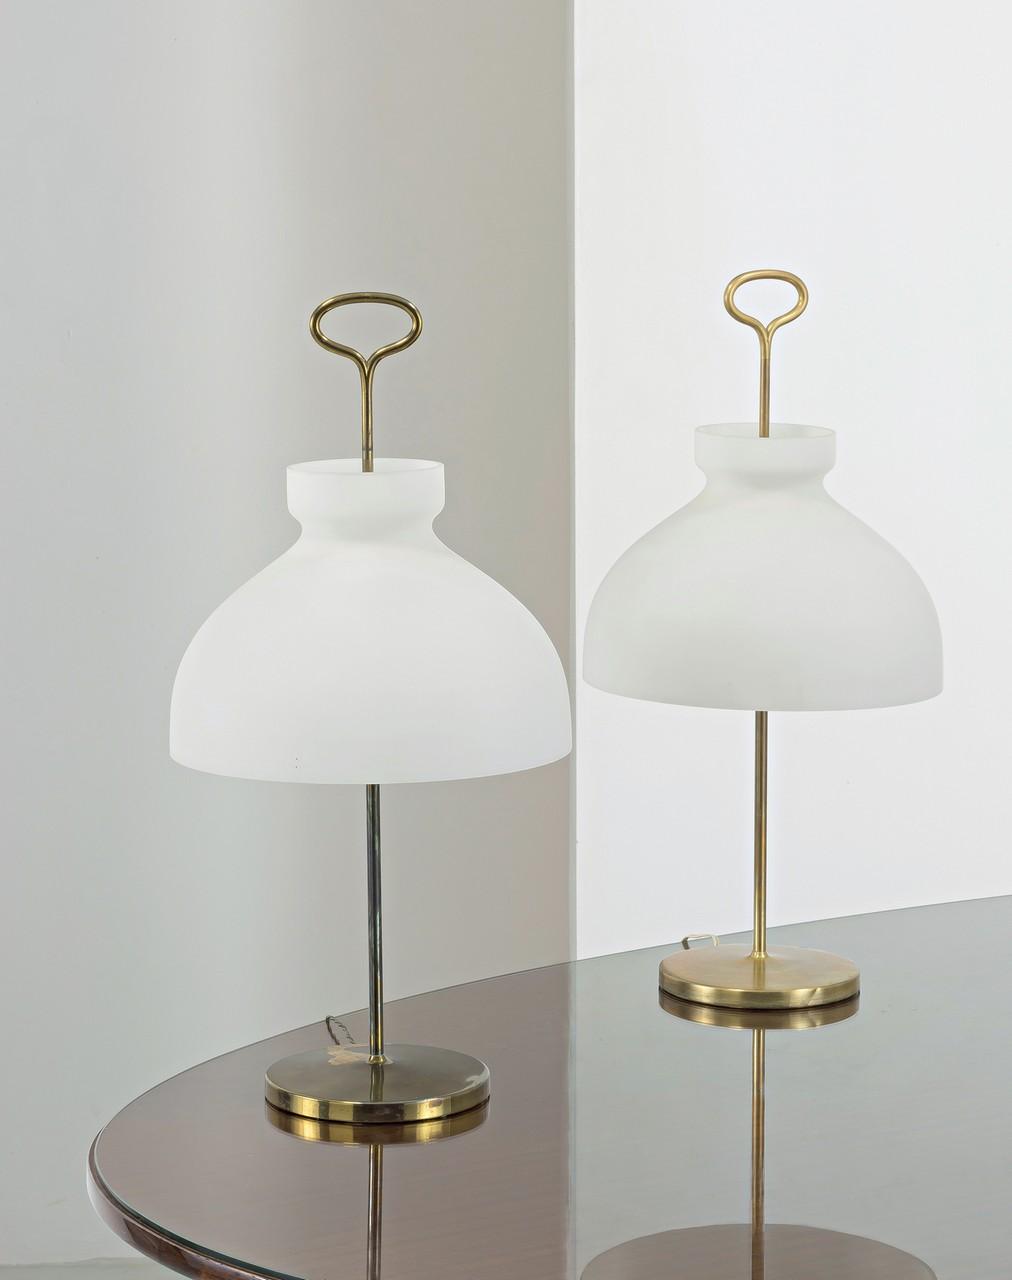 Lampade Da Tavolo Salotto: Lampada da comodino moderna lampade ...